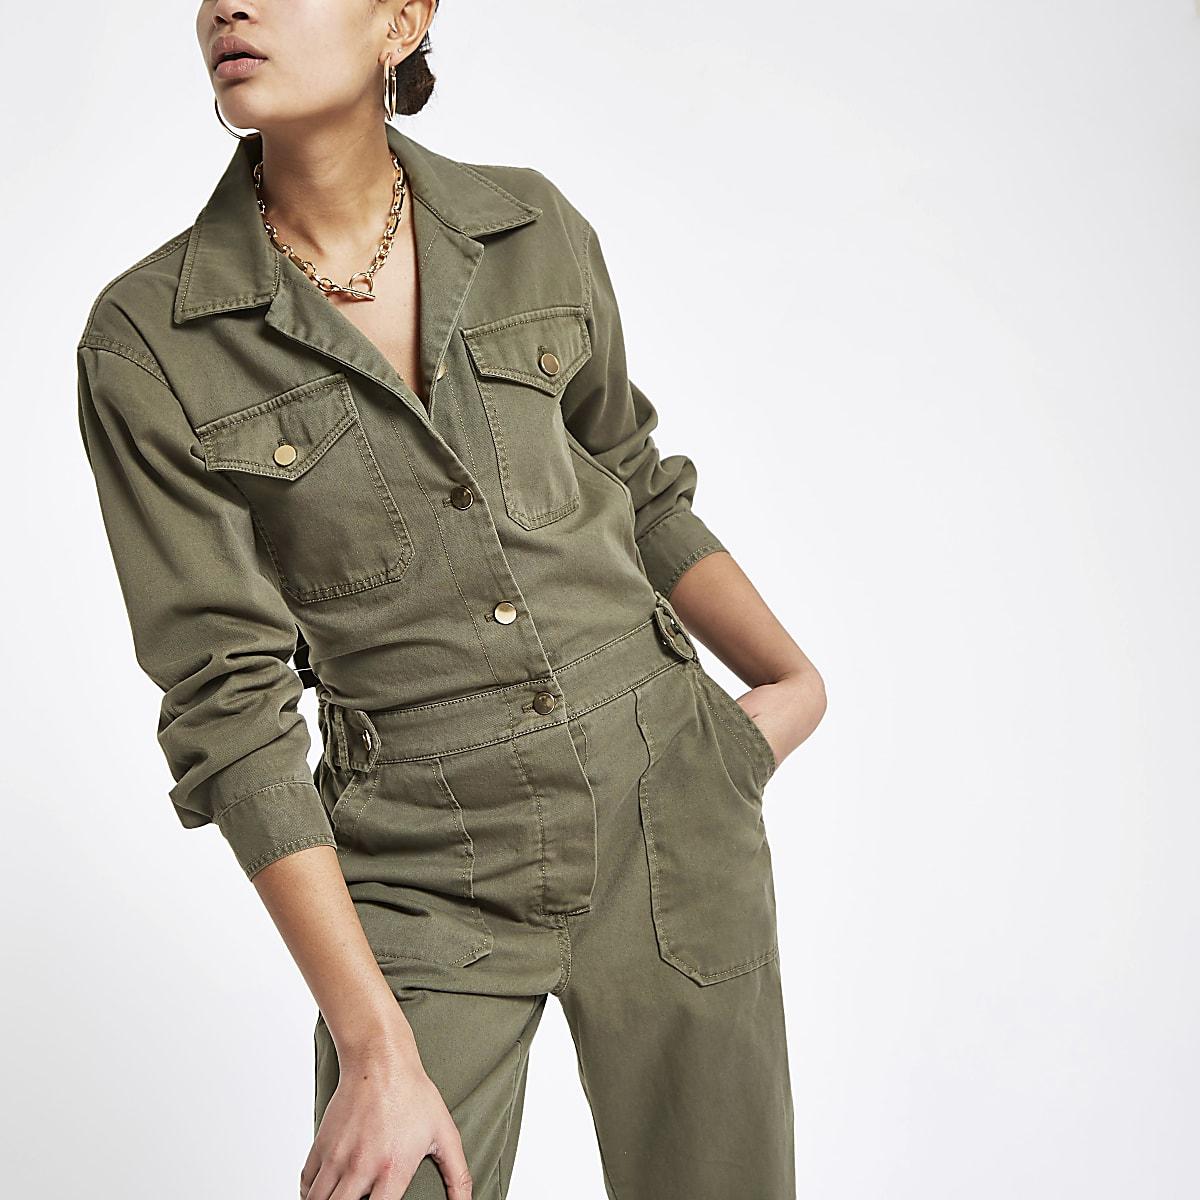 Khaki utility boiler jumpsuit